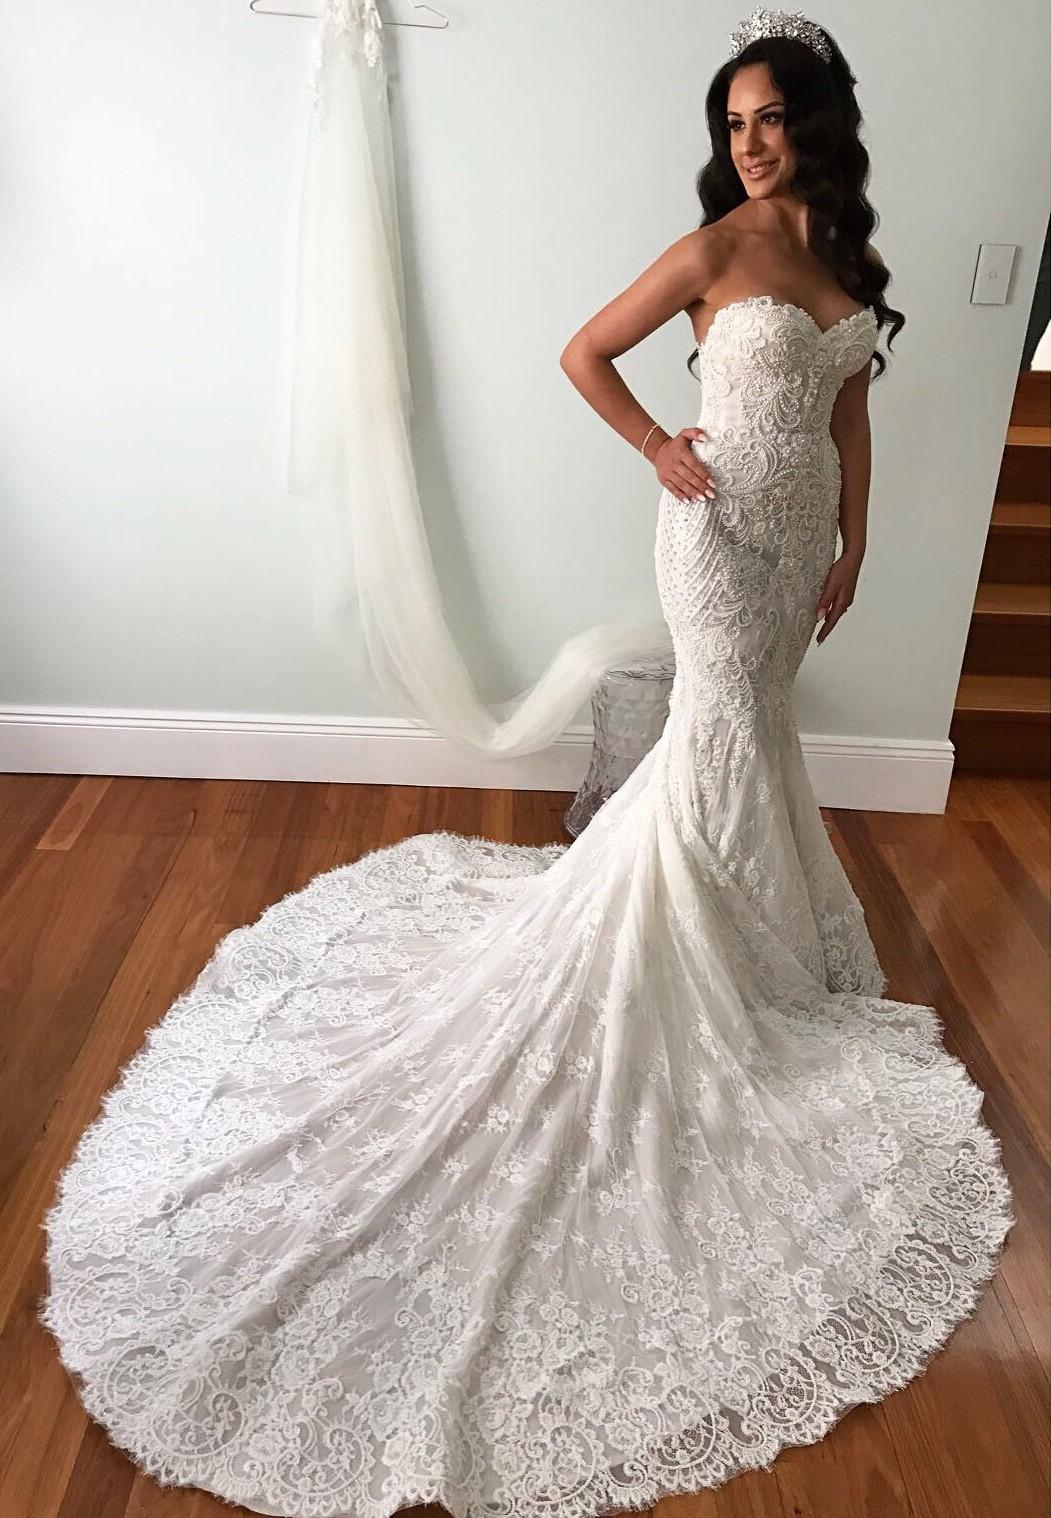 ce952525a8 Steven Khalil Custom Made Second Hand Wedding Dress on Sale 60% Off ...